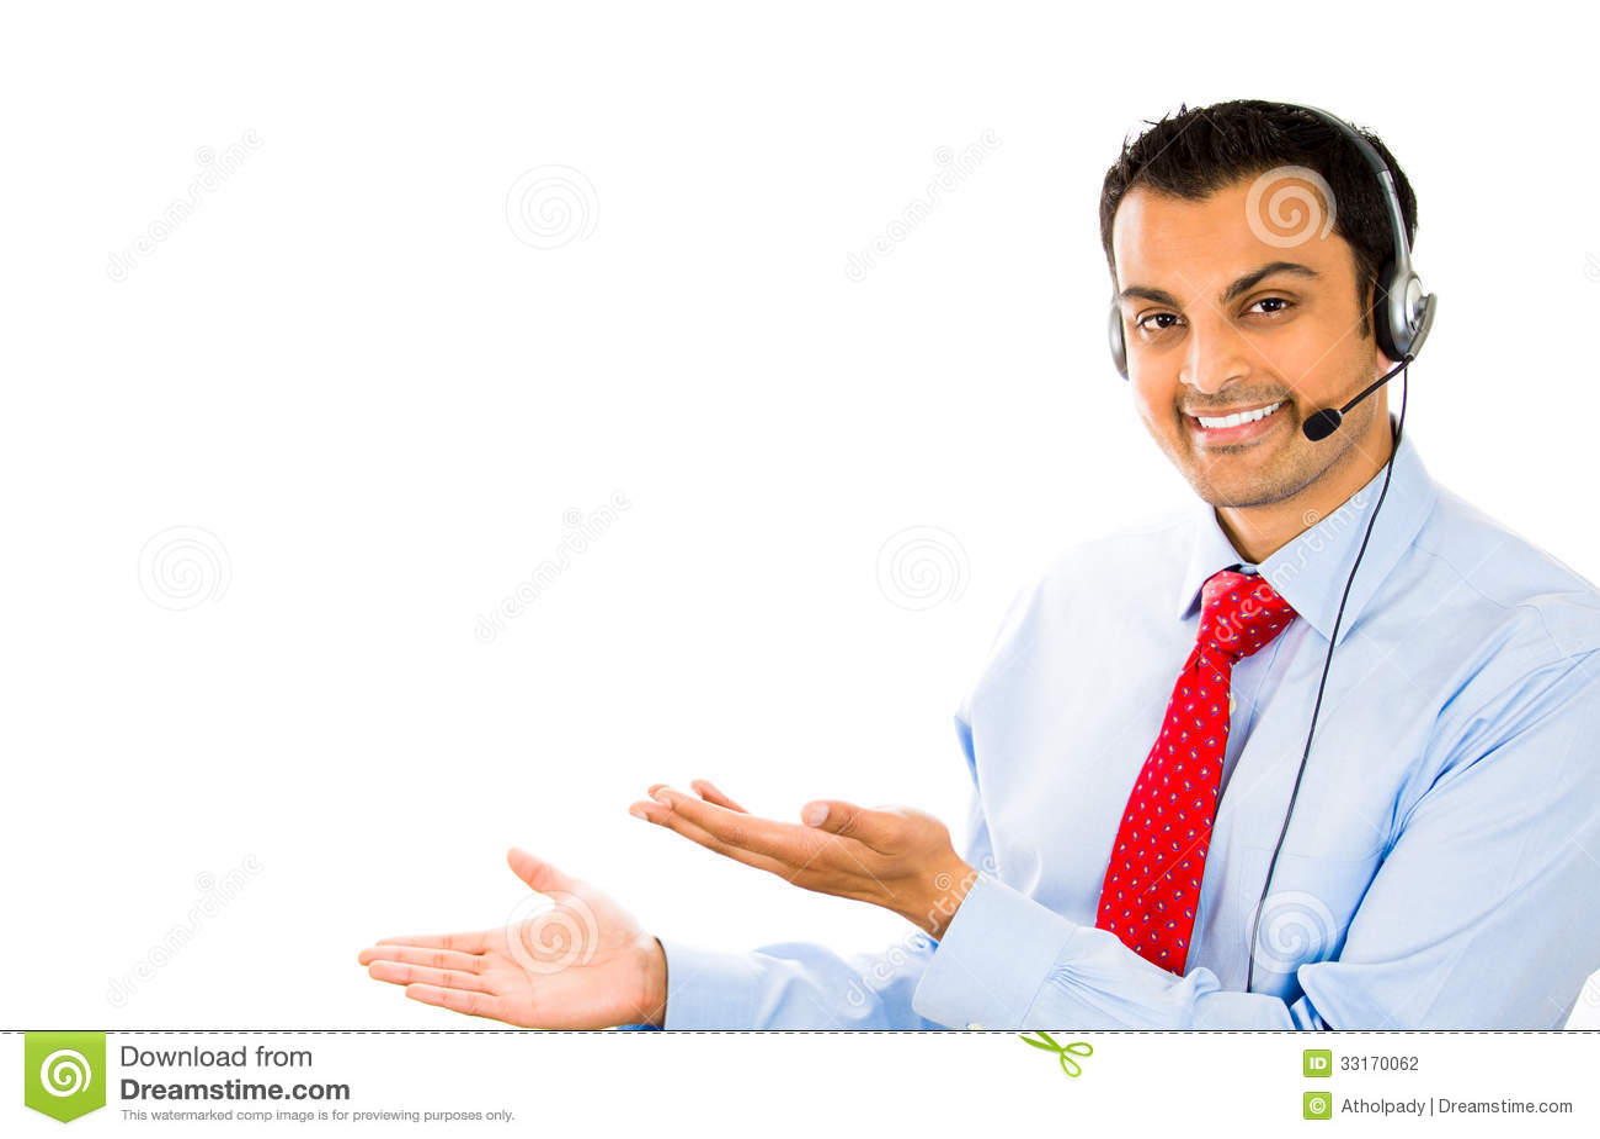 Smiling Businessman    Customer Service Representative Talking On Headset Stock Photography